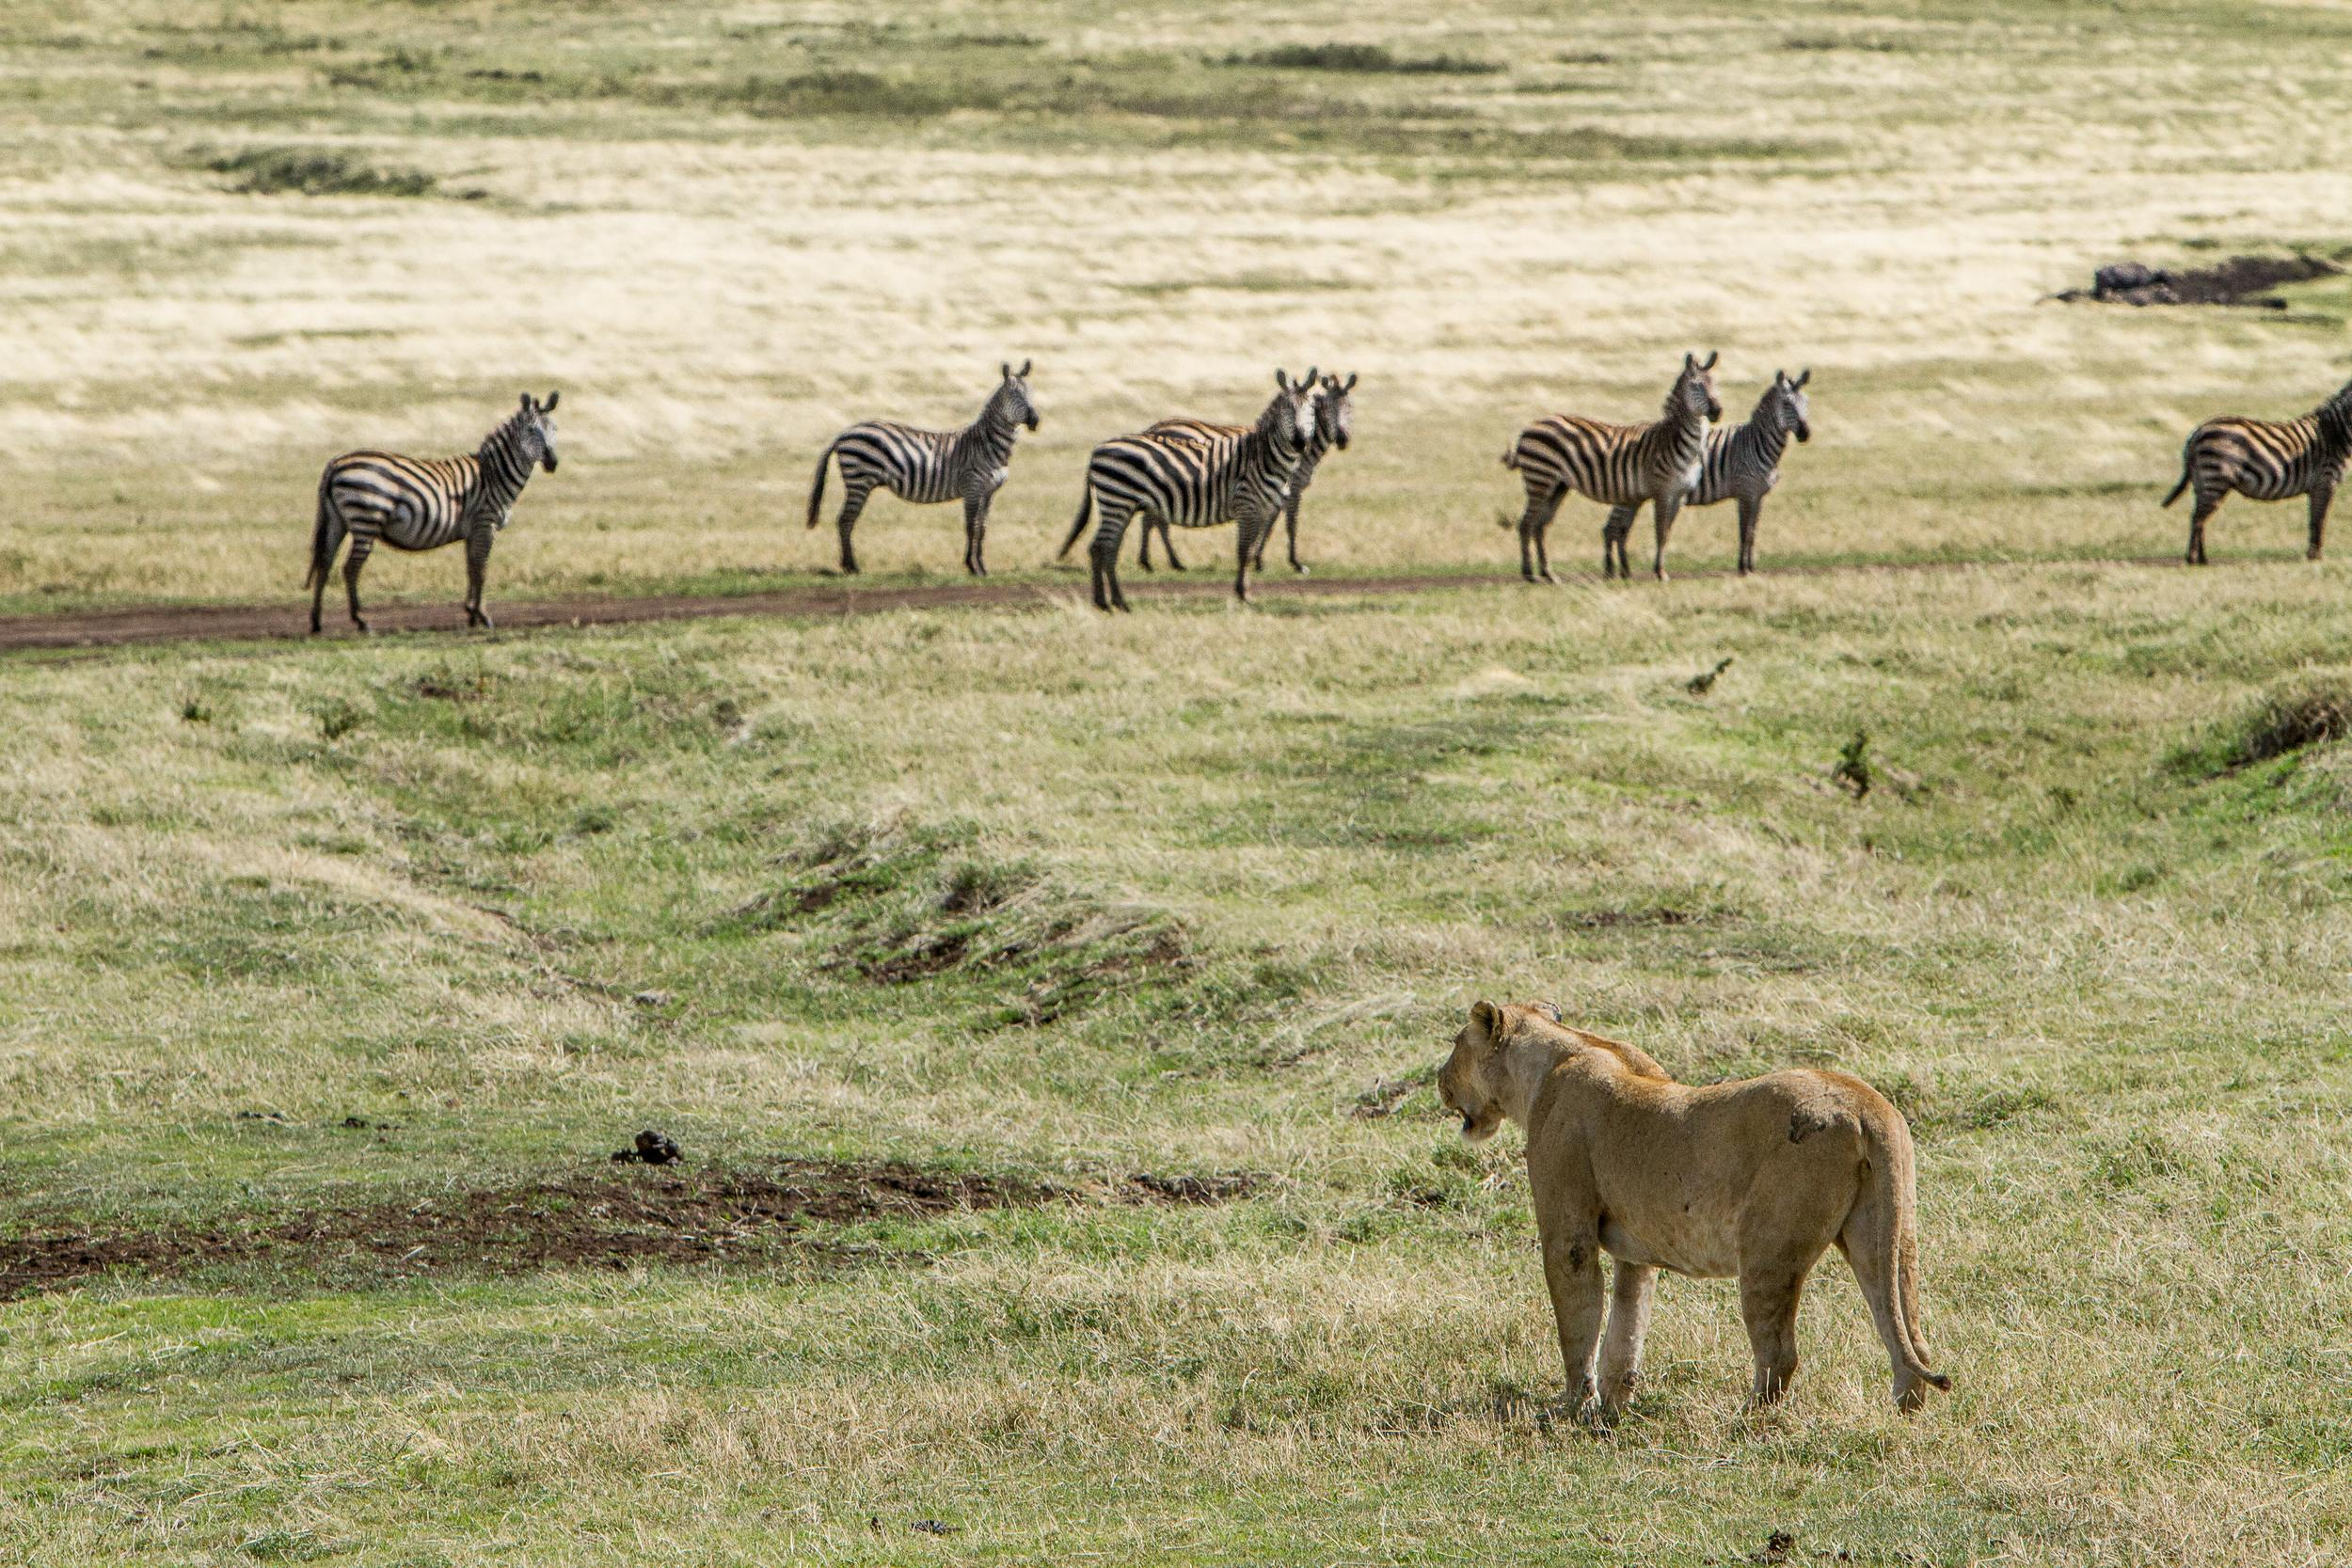 Encounter Gorilla and Wildlife Safari in East Africa